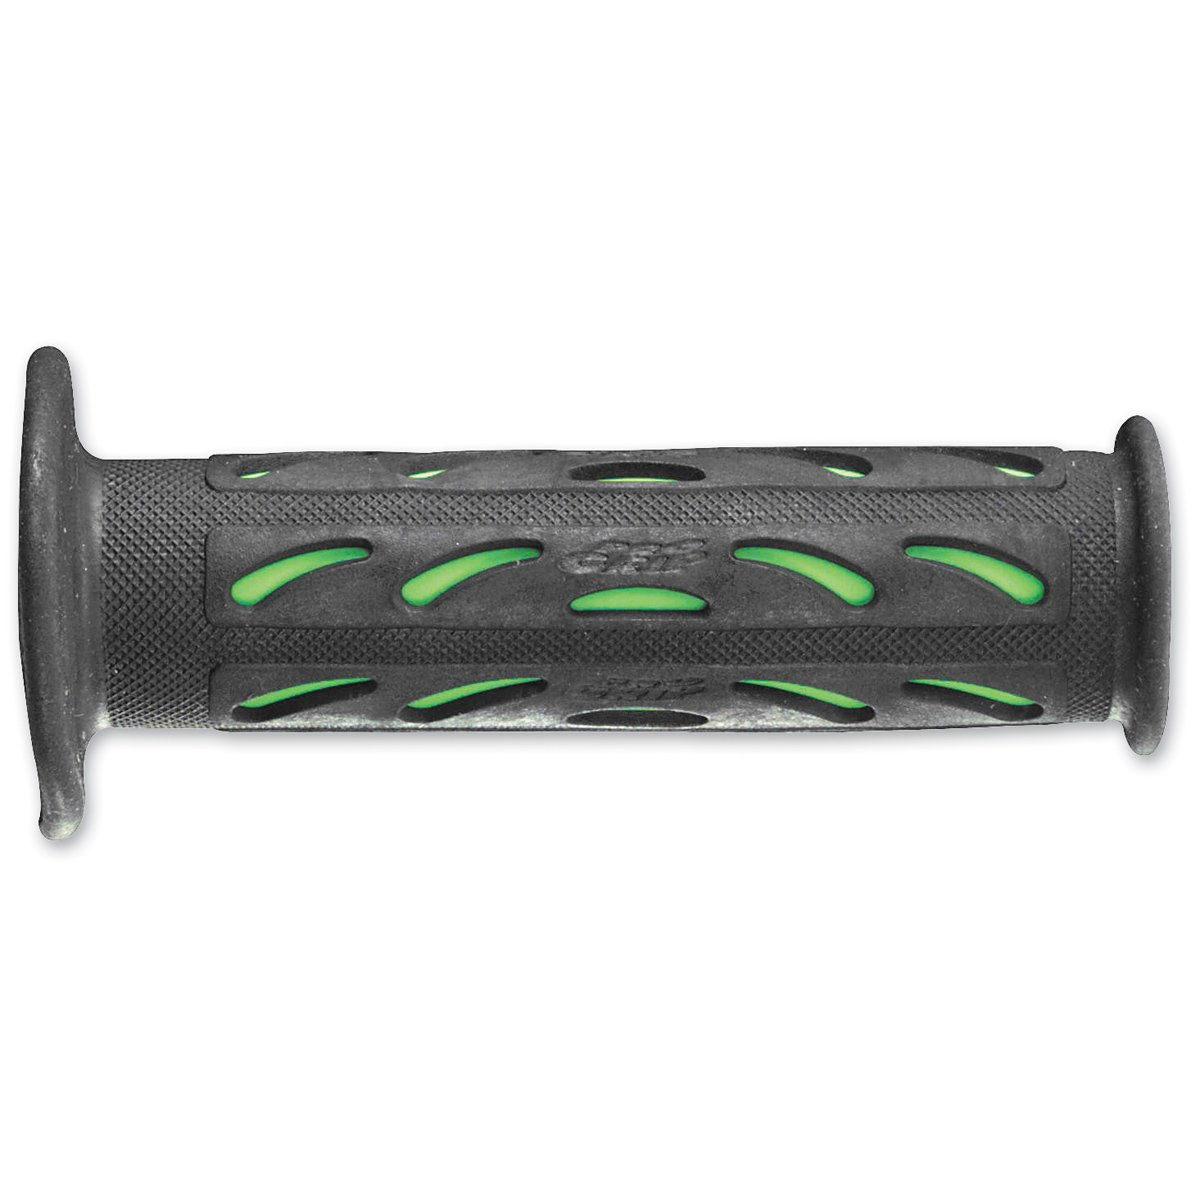 Black//Green Pro Grip Superbike 724 Duo Density Road Grips 120mm